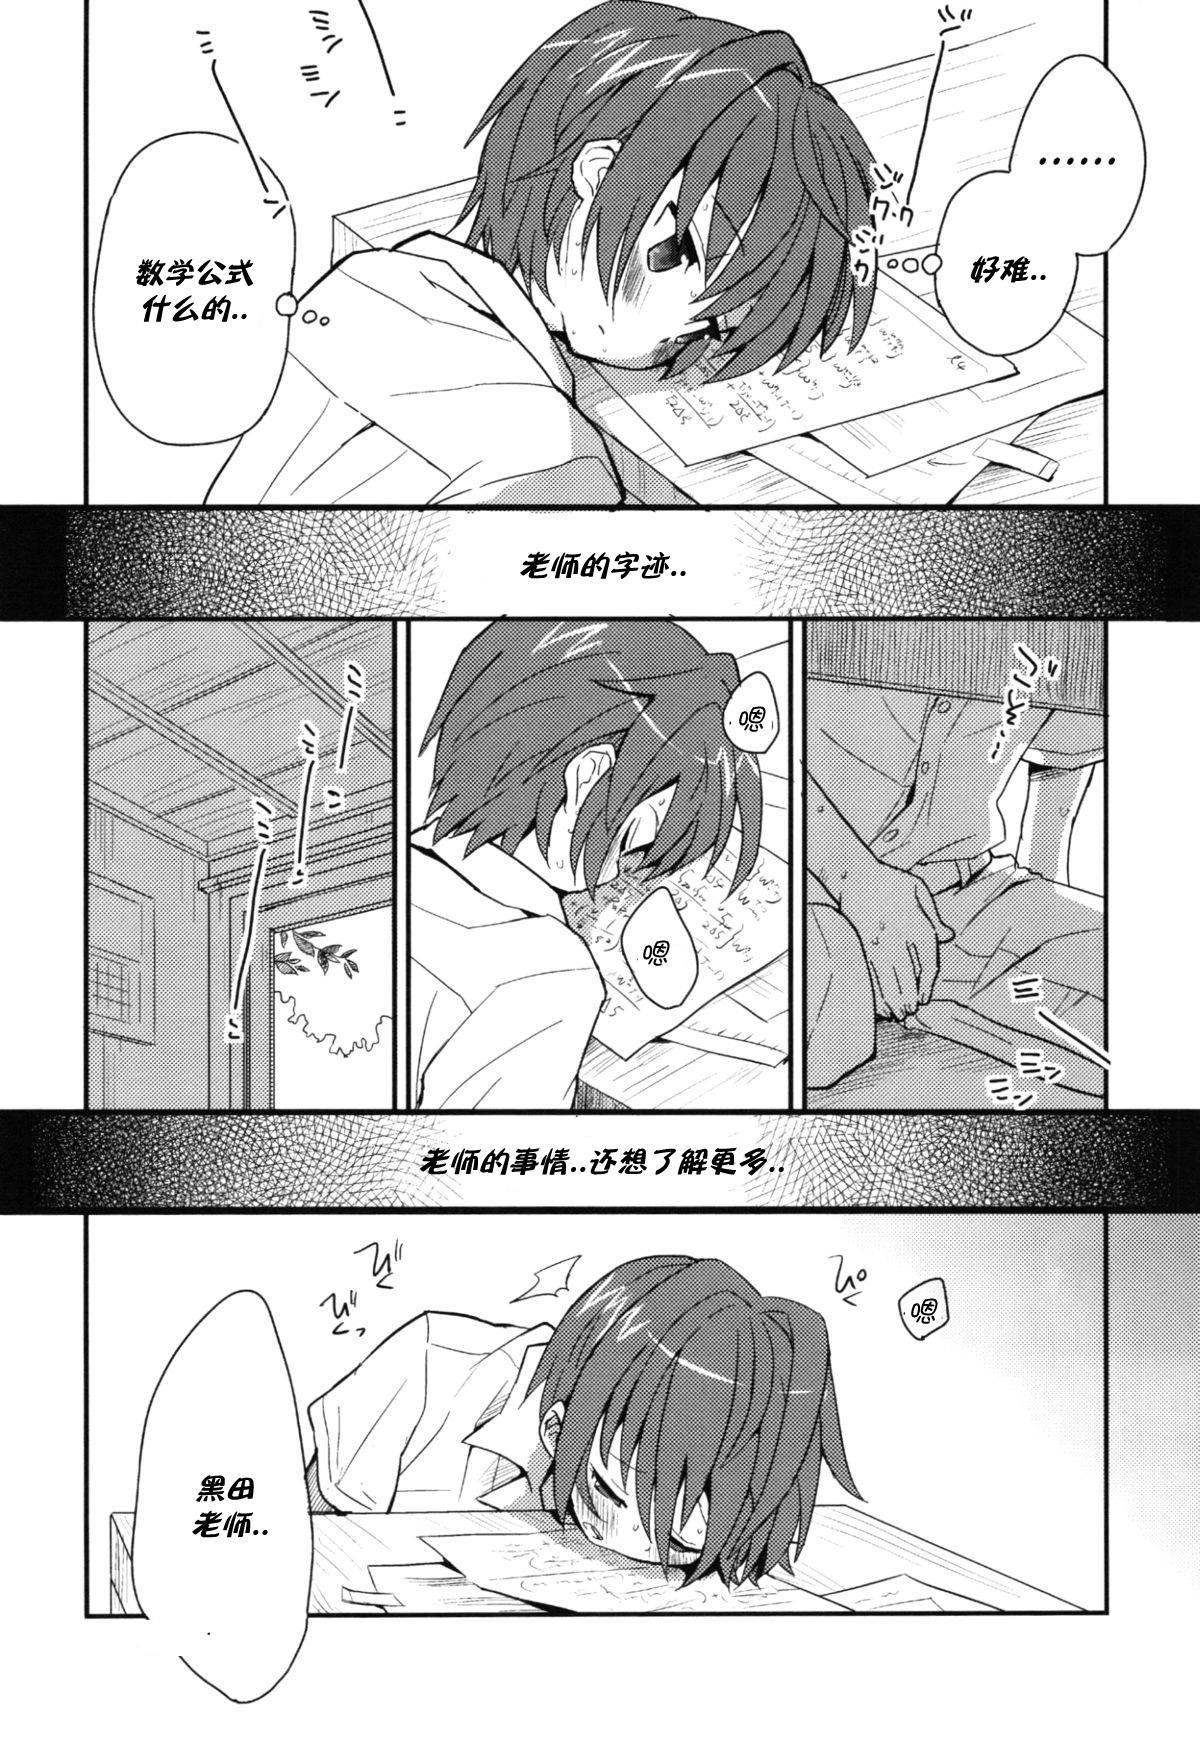 Sensei, Sensei 丨老师,老师 37